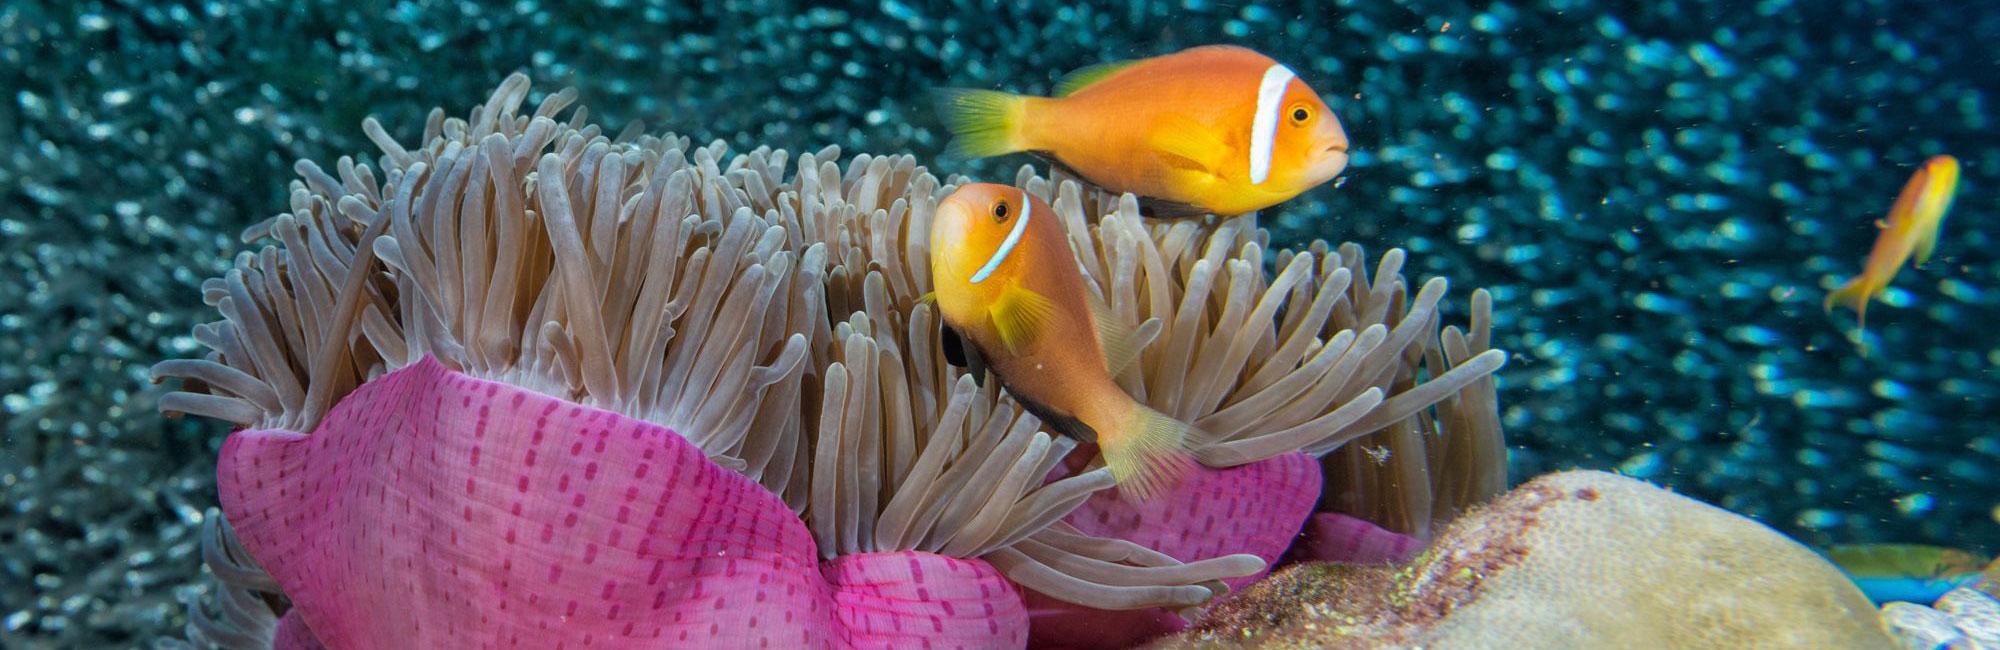 SEO - Digital Marketing - Coral Images